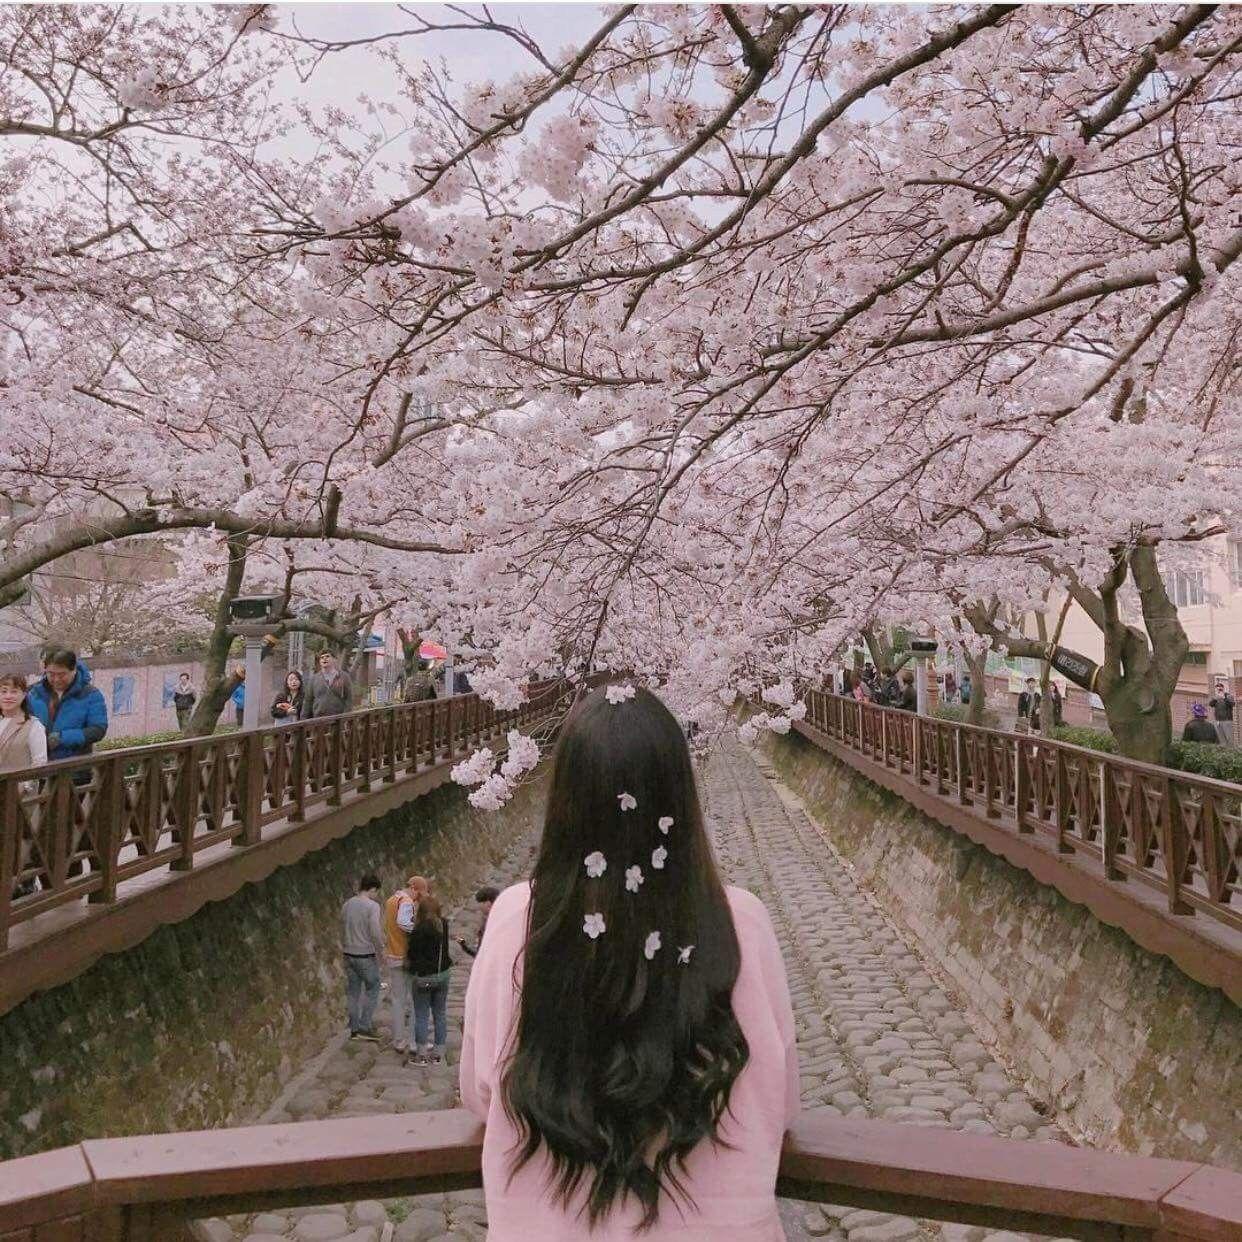 29 Gambar Aesthetic Bunga Sakura Sugriwa Gambar